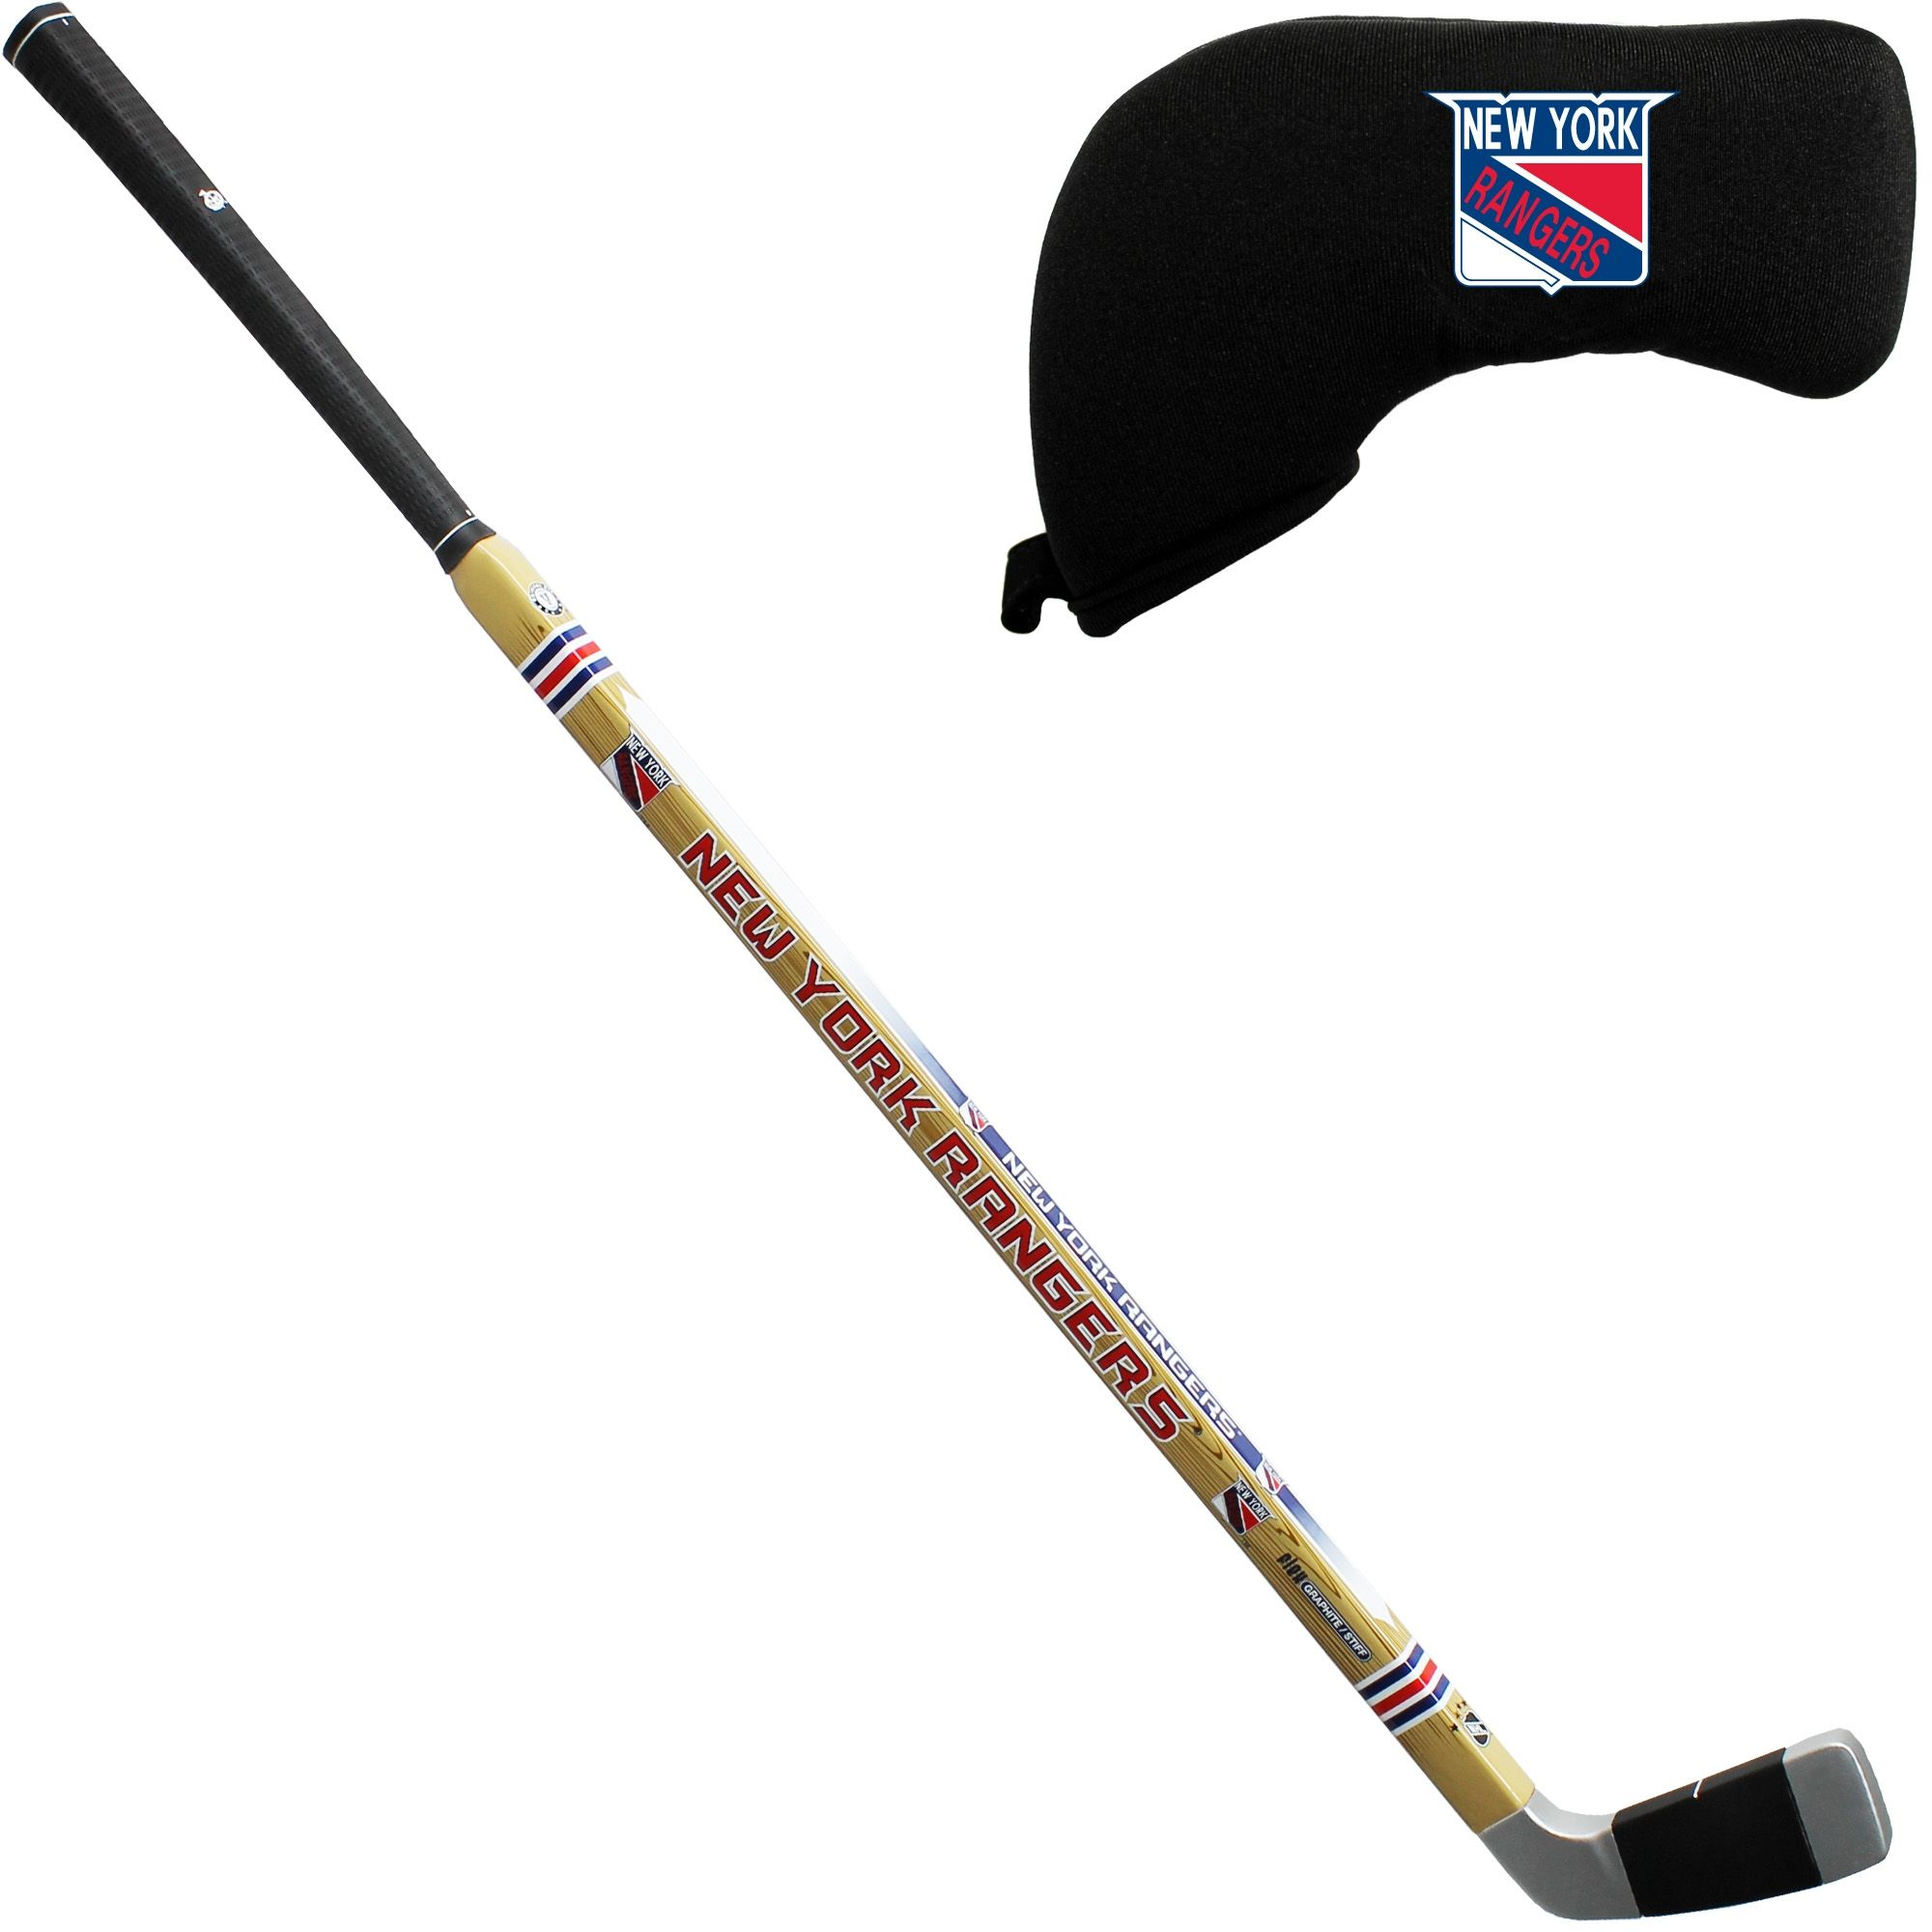 Original Six Wood Edition New York Rangers Hockey Stick Golf Putter Retail 115 Www Hockeystickputters Com Hockey Stick Golf Putters Montreal Canadiens Hockey